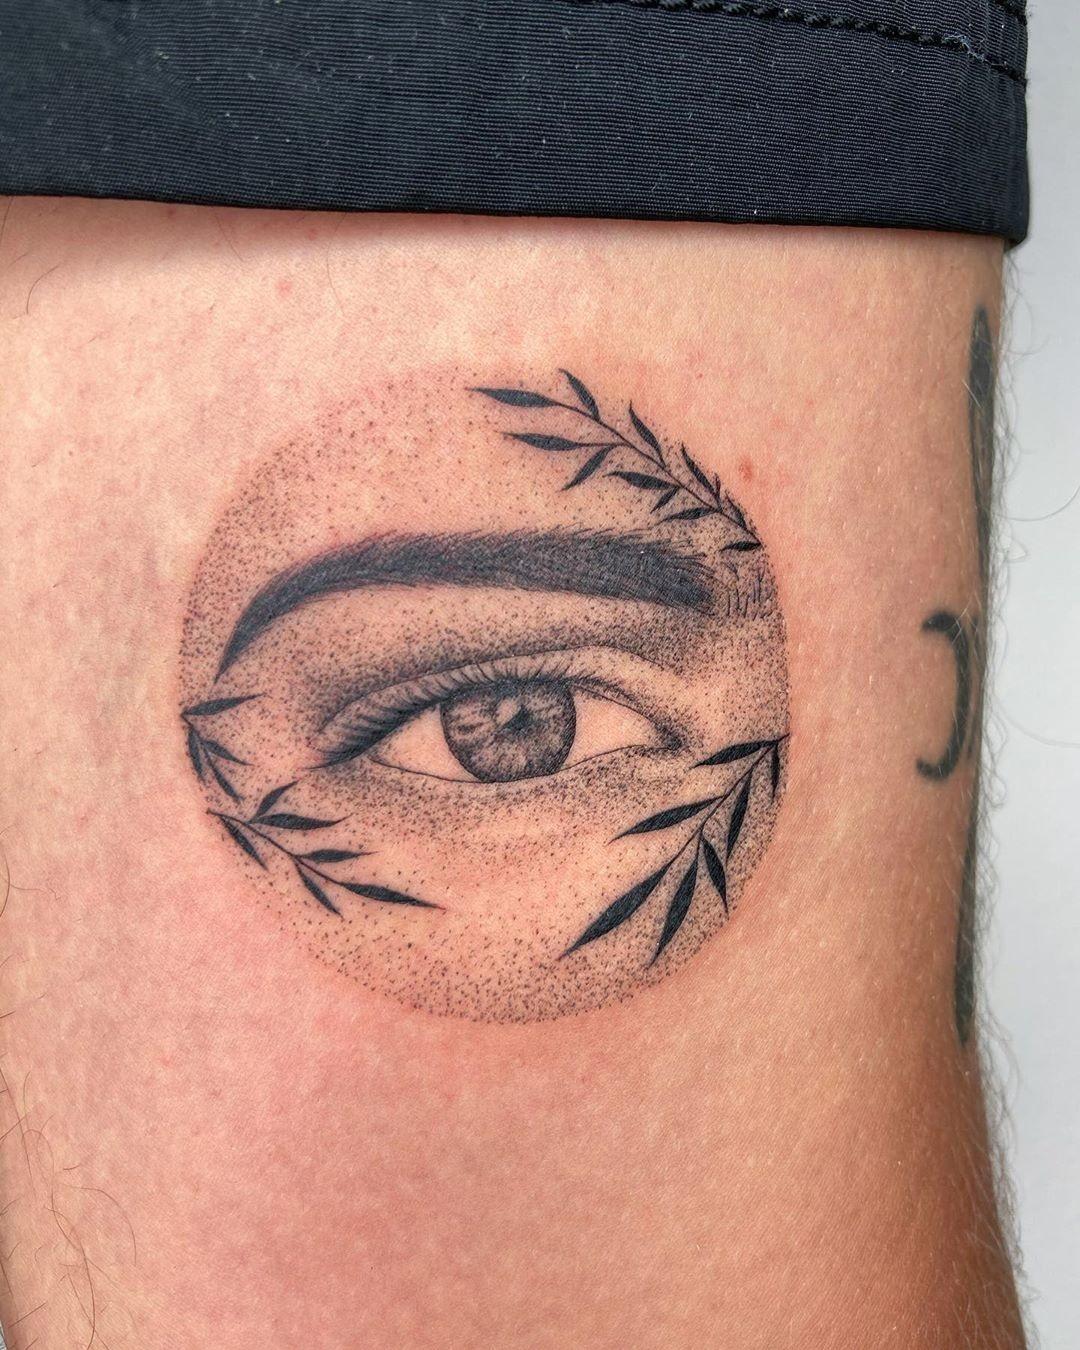 Inksearch tattoo Zuzanna Gądek